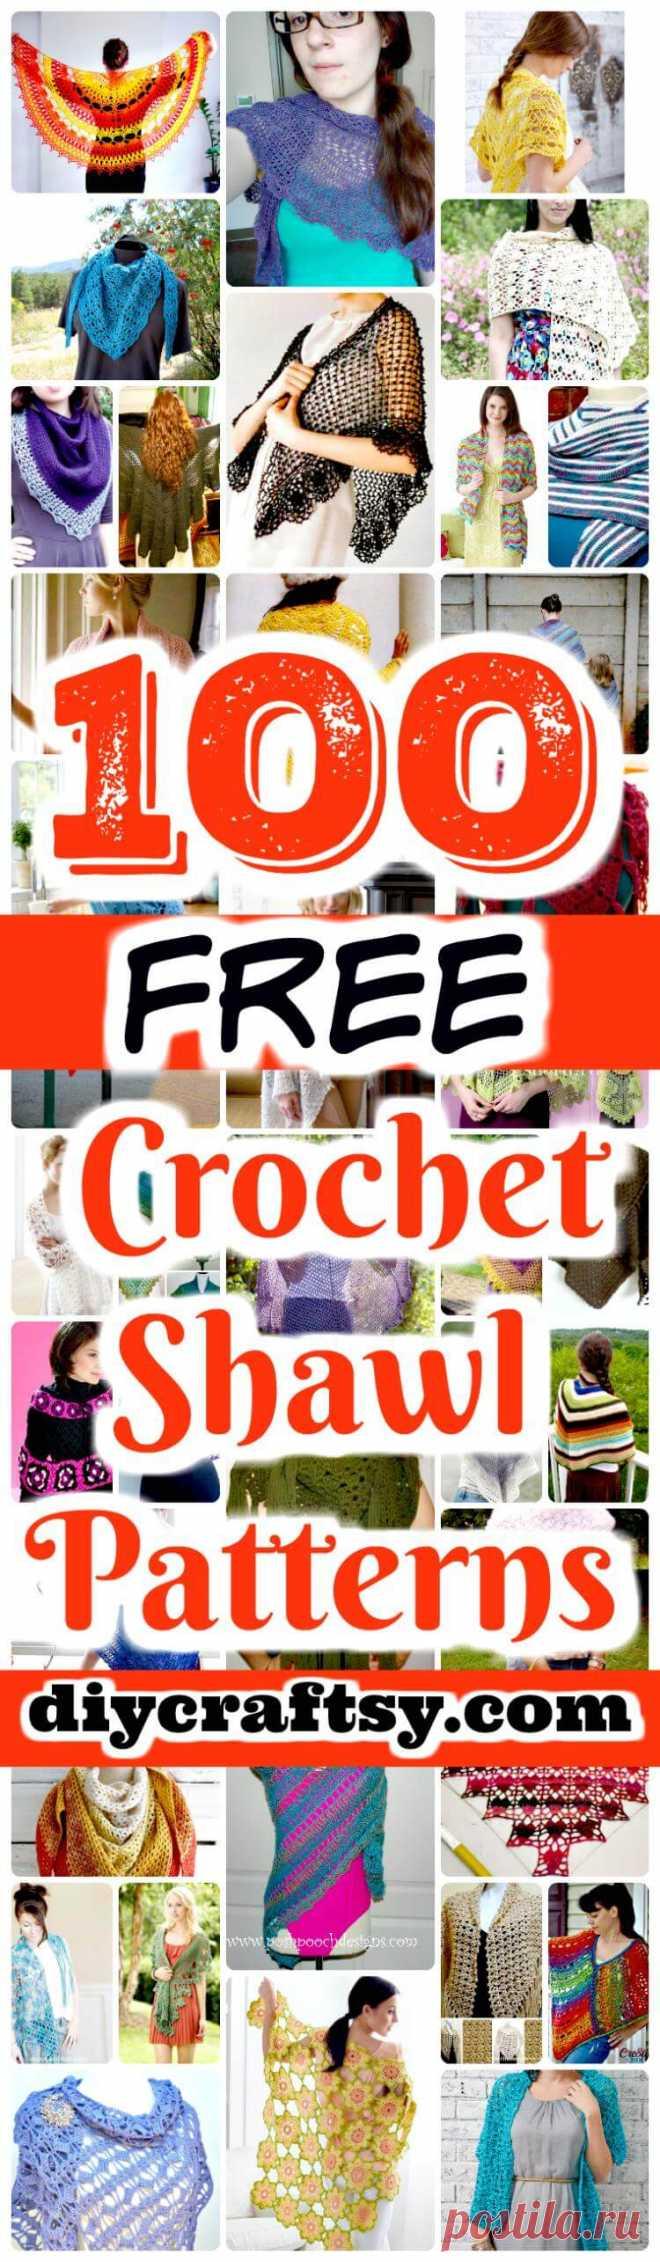 100 Free Crochet Shawl Patterns - Free Crochet Patterns ⋆ DIY Crafts